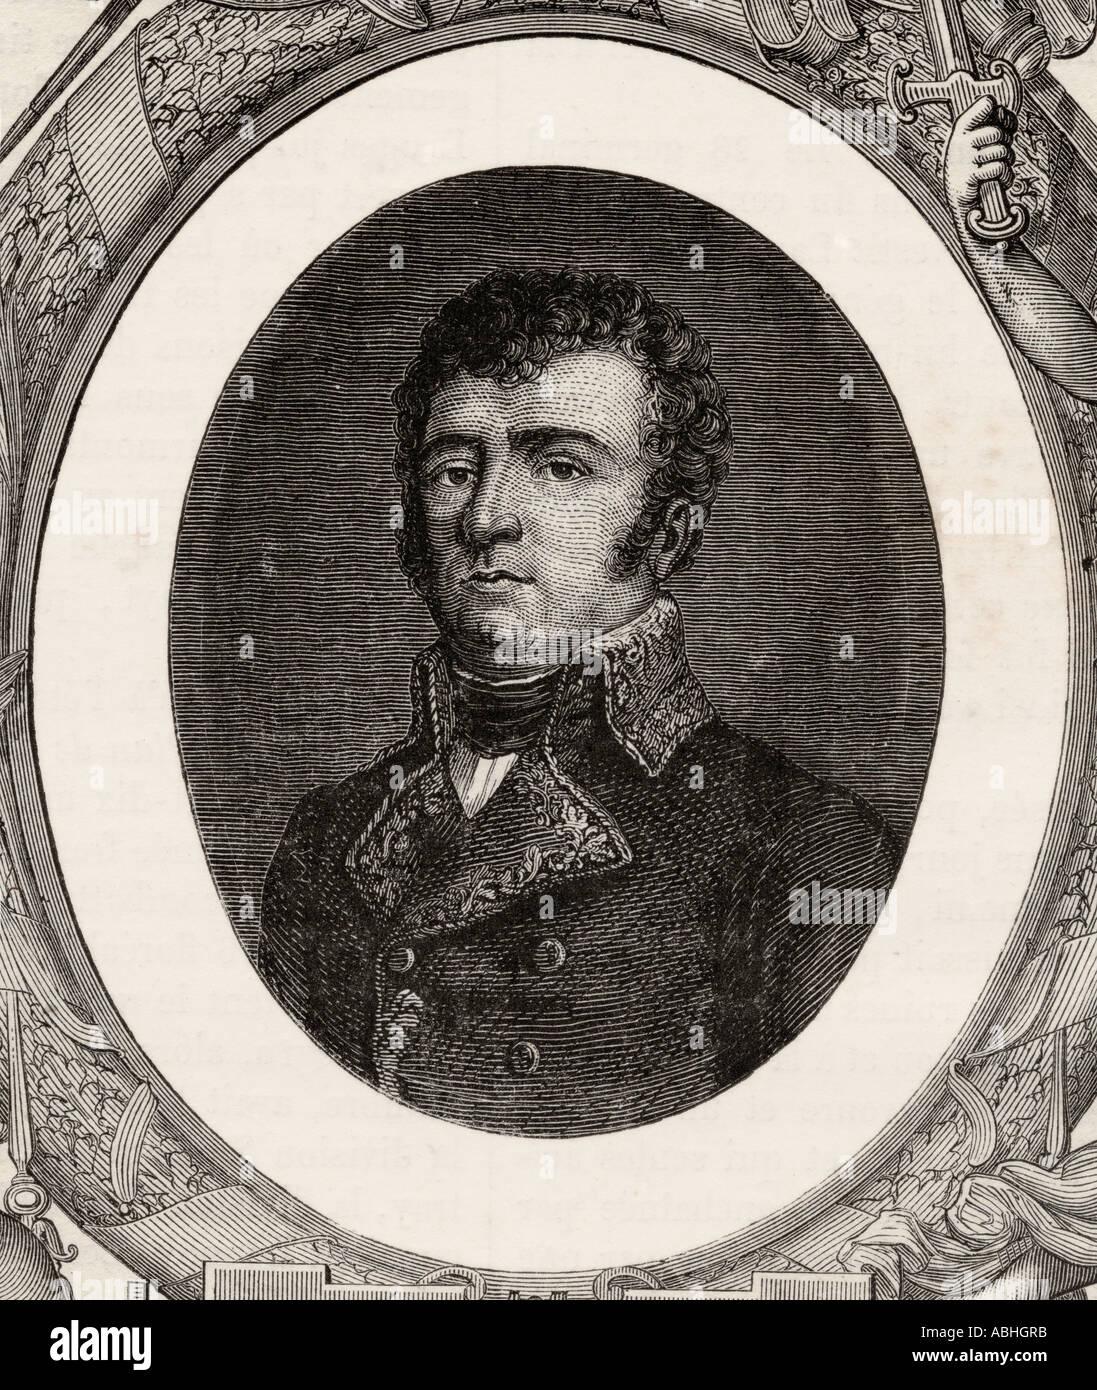 Dominique Vandamme 1770 1830 French general from Histoire de la Revolution Francaise by Louis Blanc Stock Photo